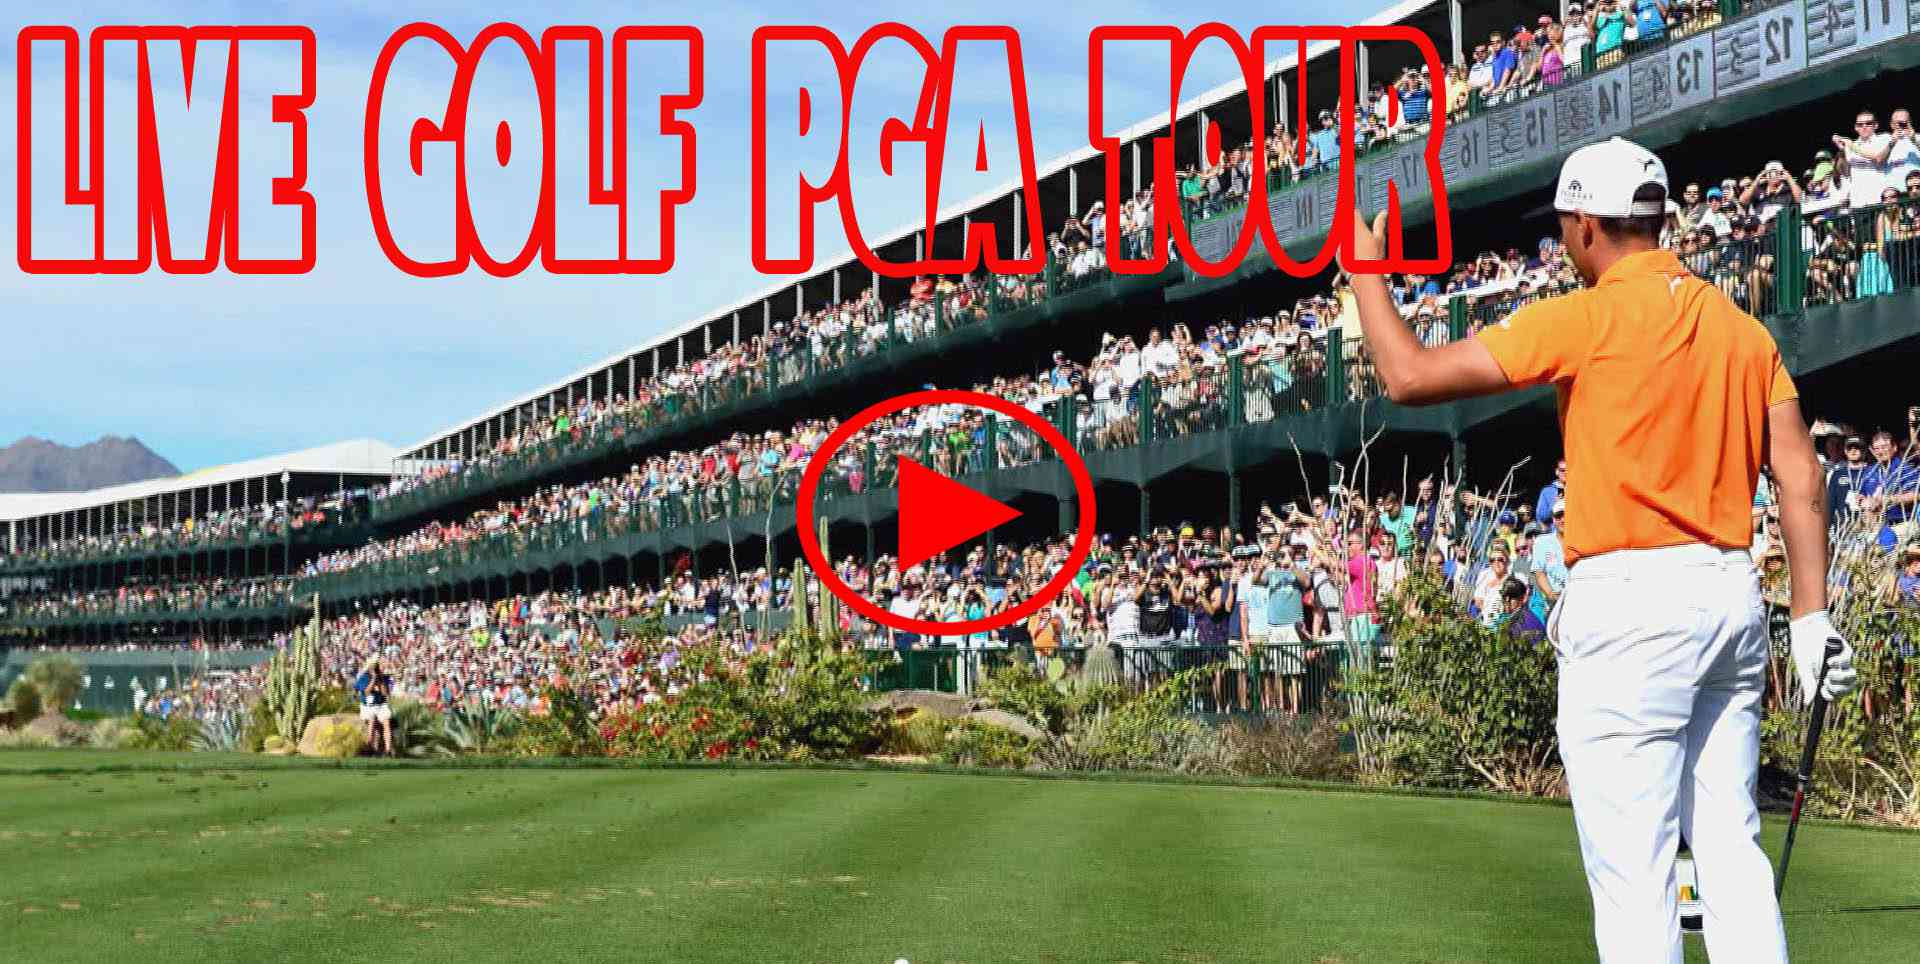 watch-2014-u.s.-open-golf-championship-online